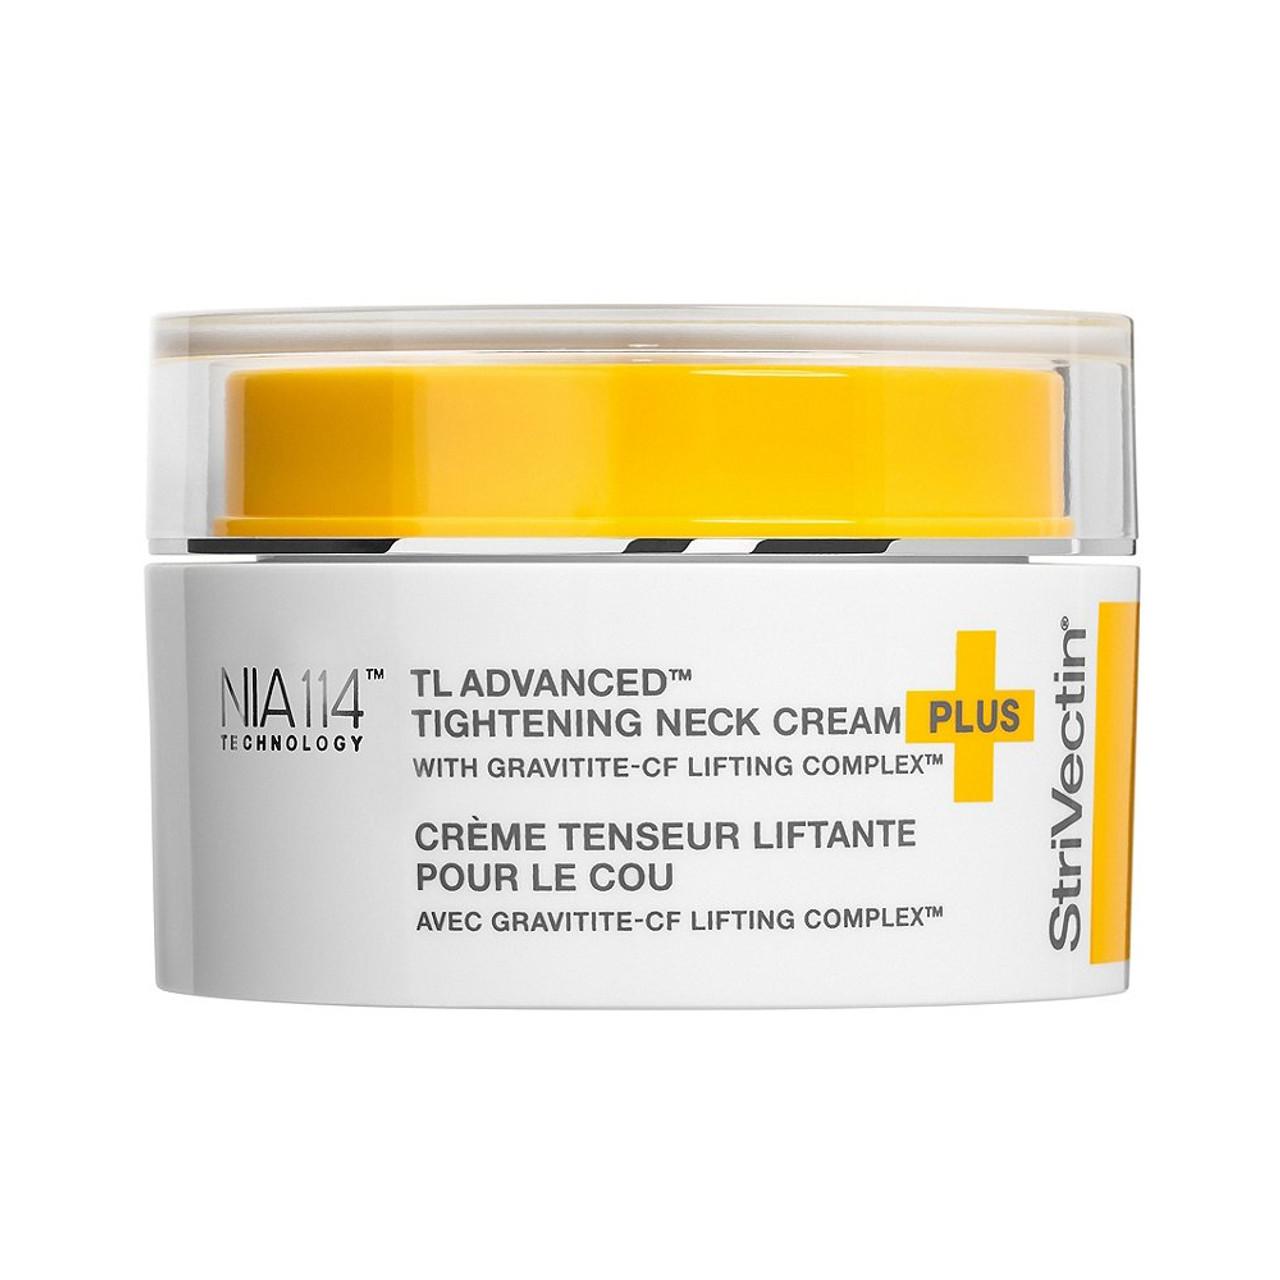 StriVectin-TL Advanced Tightening Neck Cream PLUS